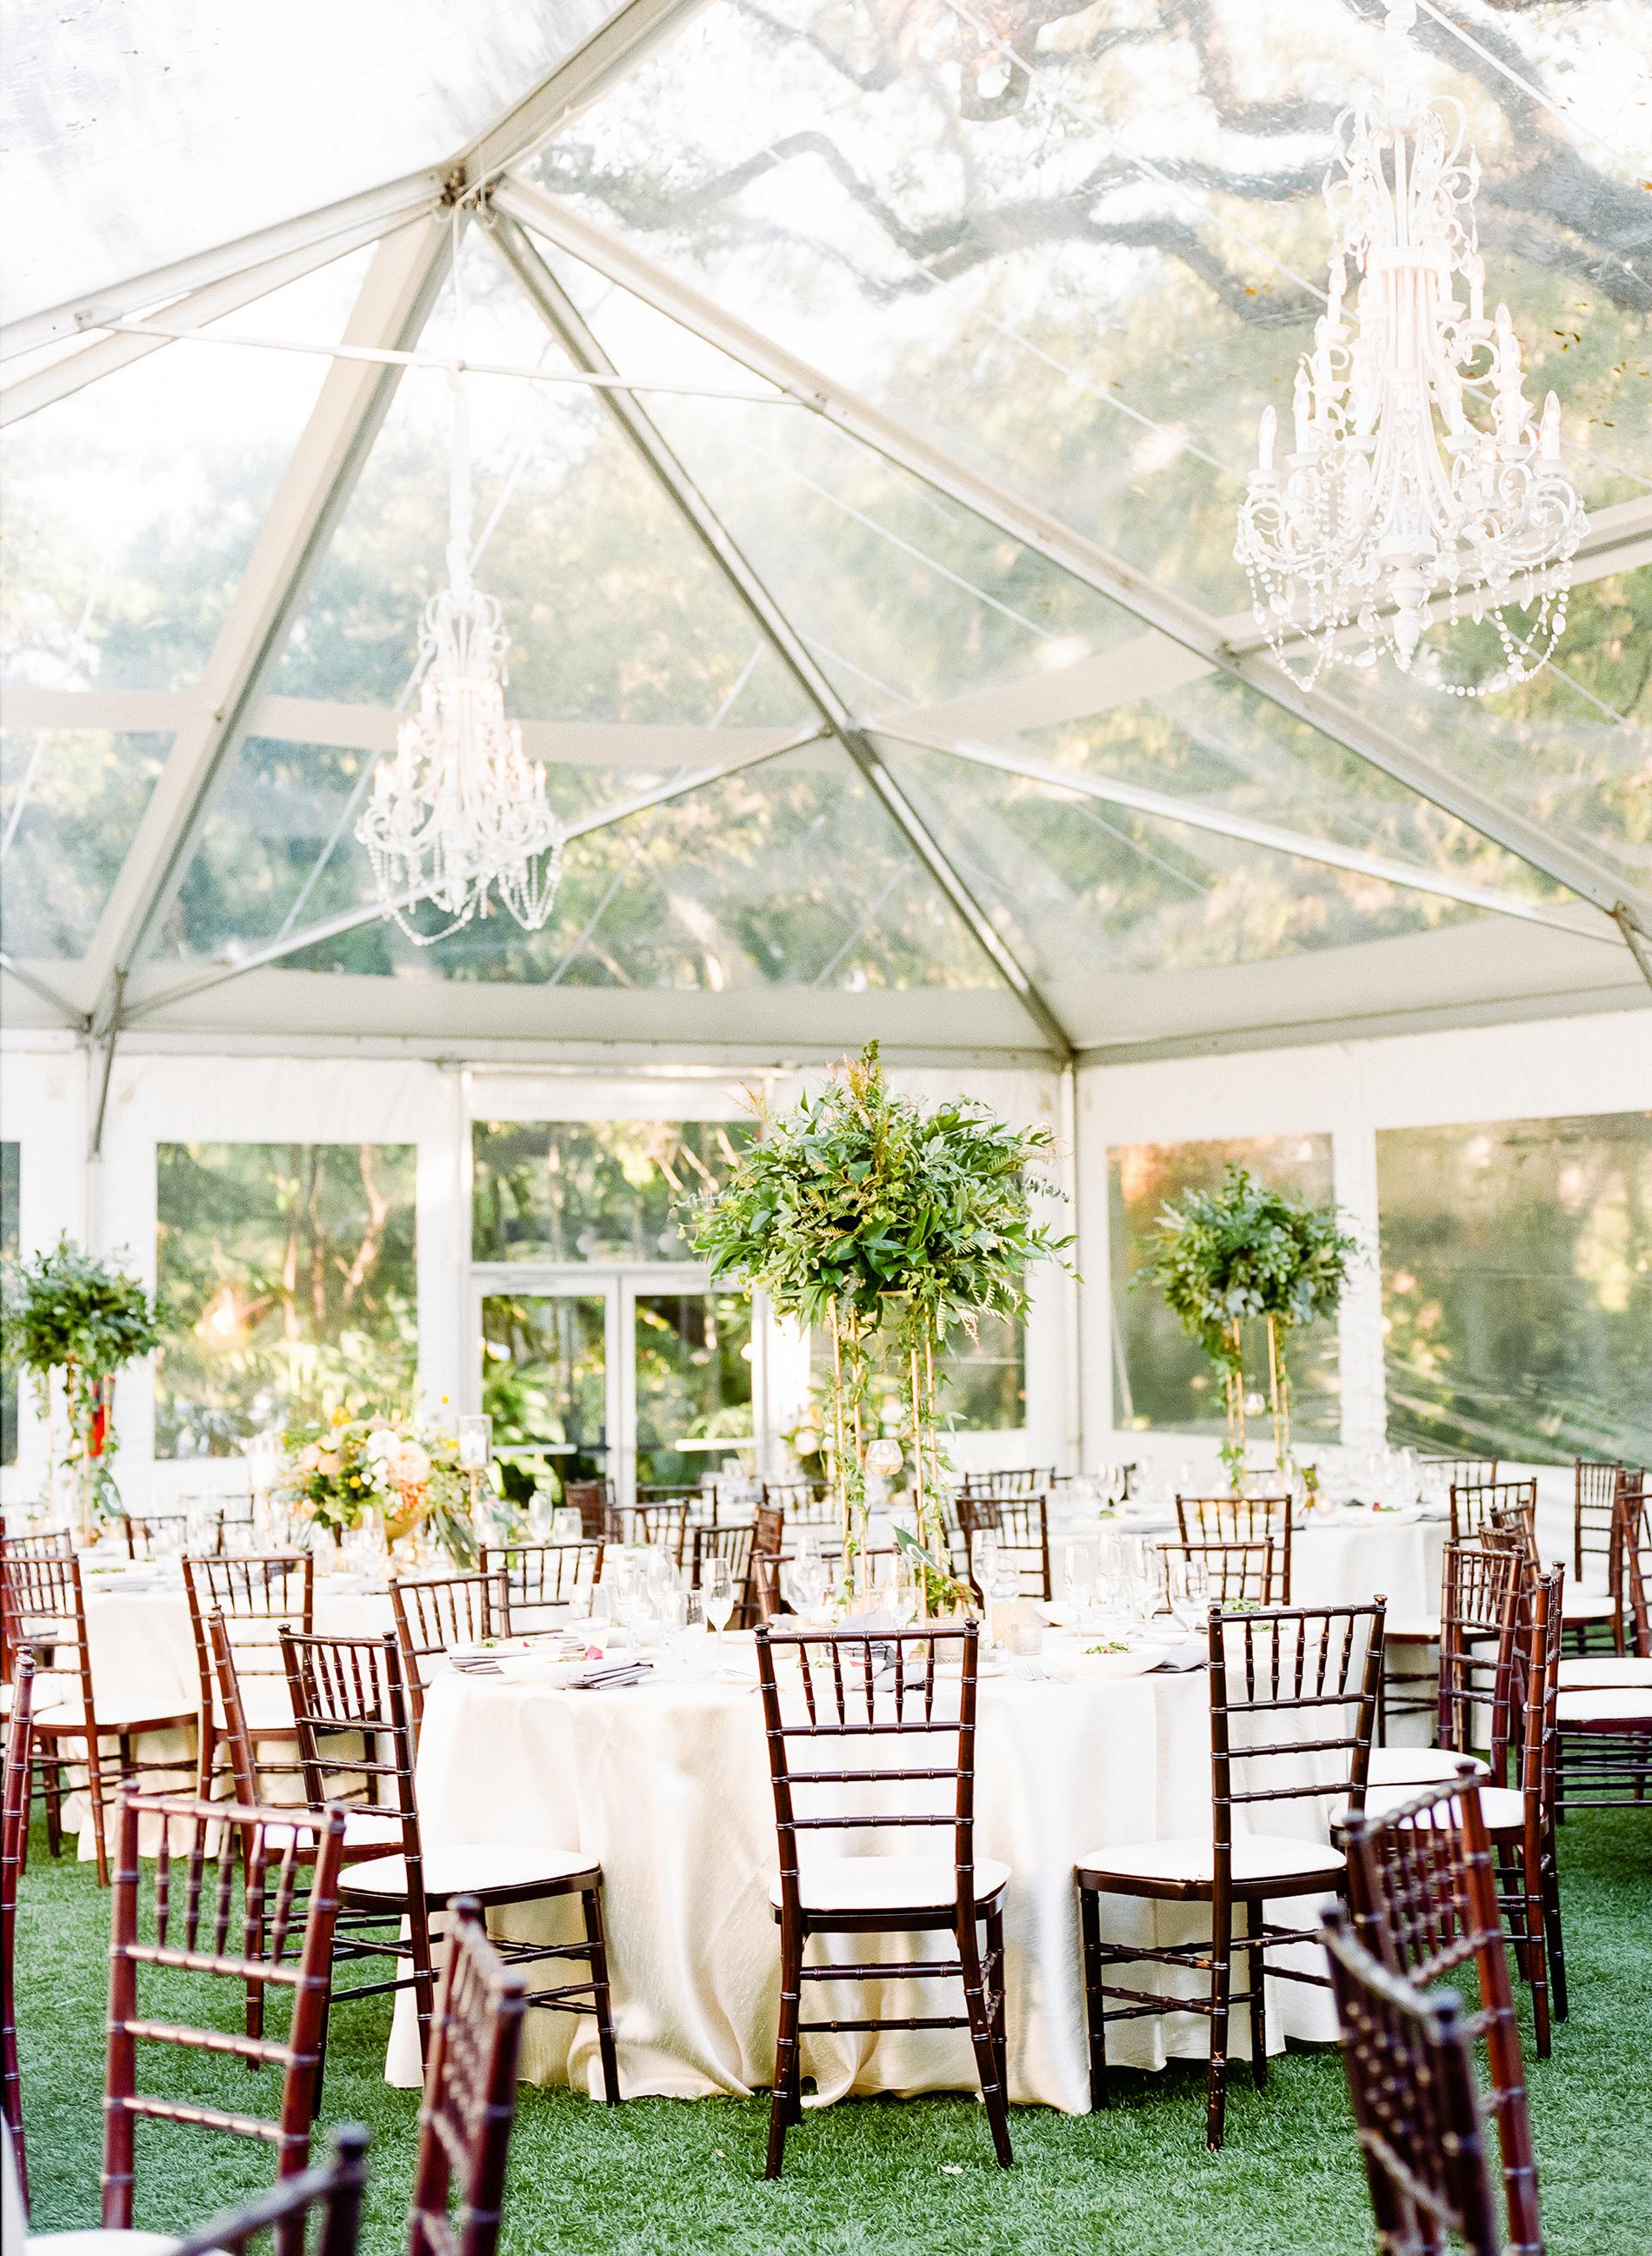 anuja nikhil wedding reception clear tent